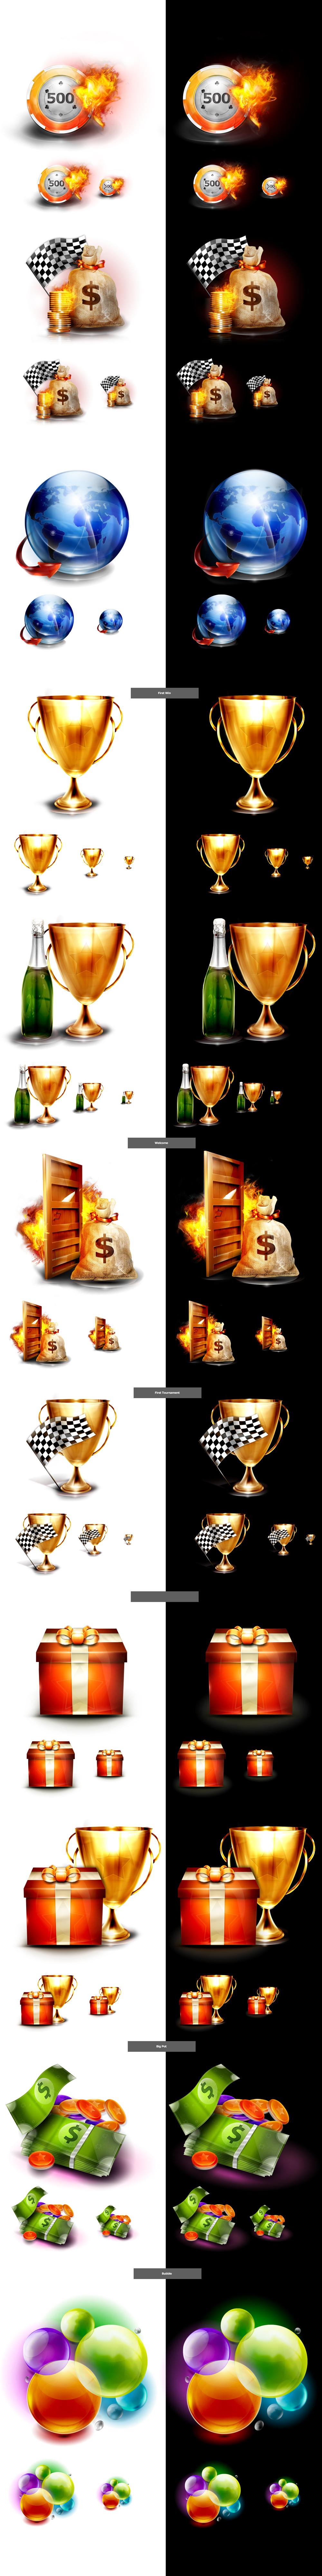 ganymade icon set1 by webdesigner1921